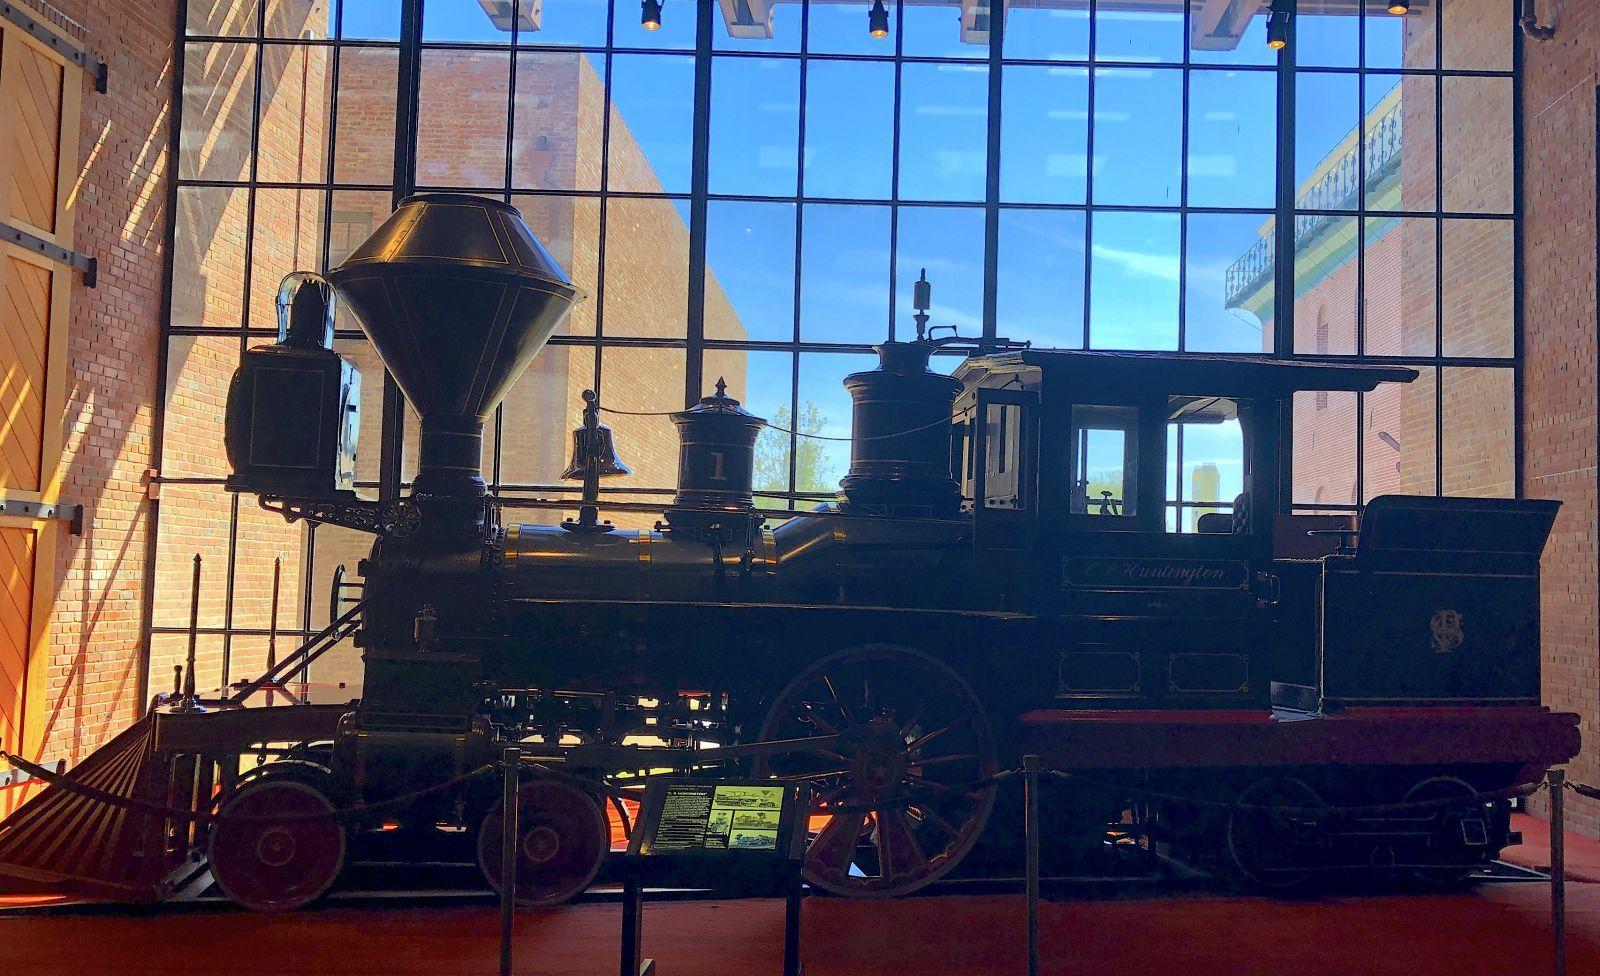 california-railroad-museum-silhouette